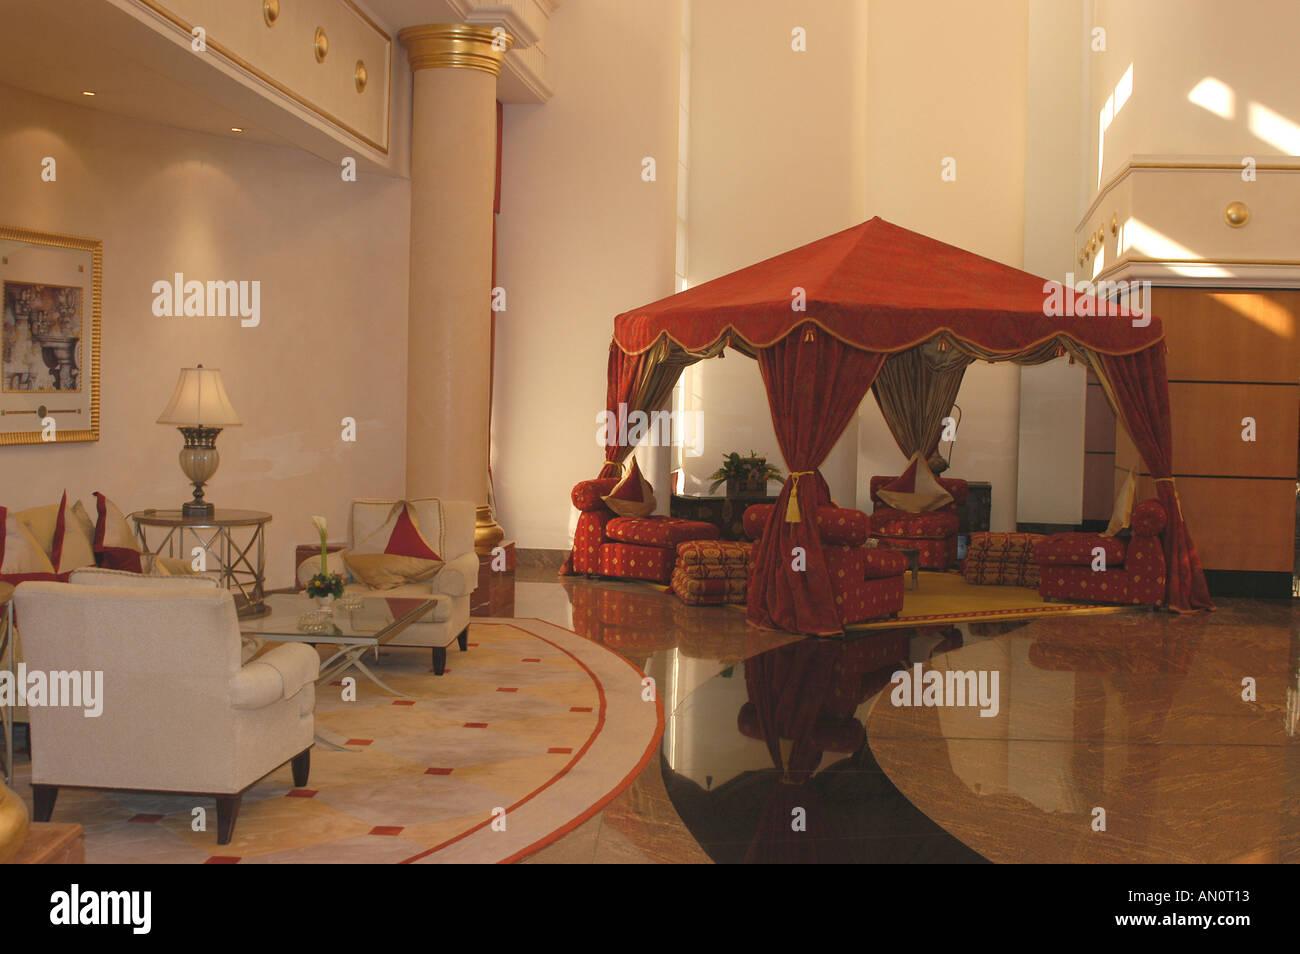 vereinigte arabische emirate vae dubai jumeirah beach luxushotel le